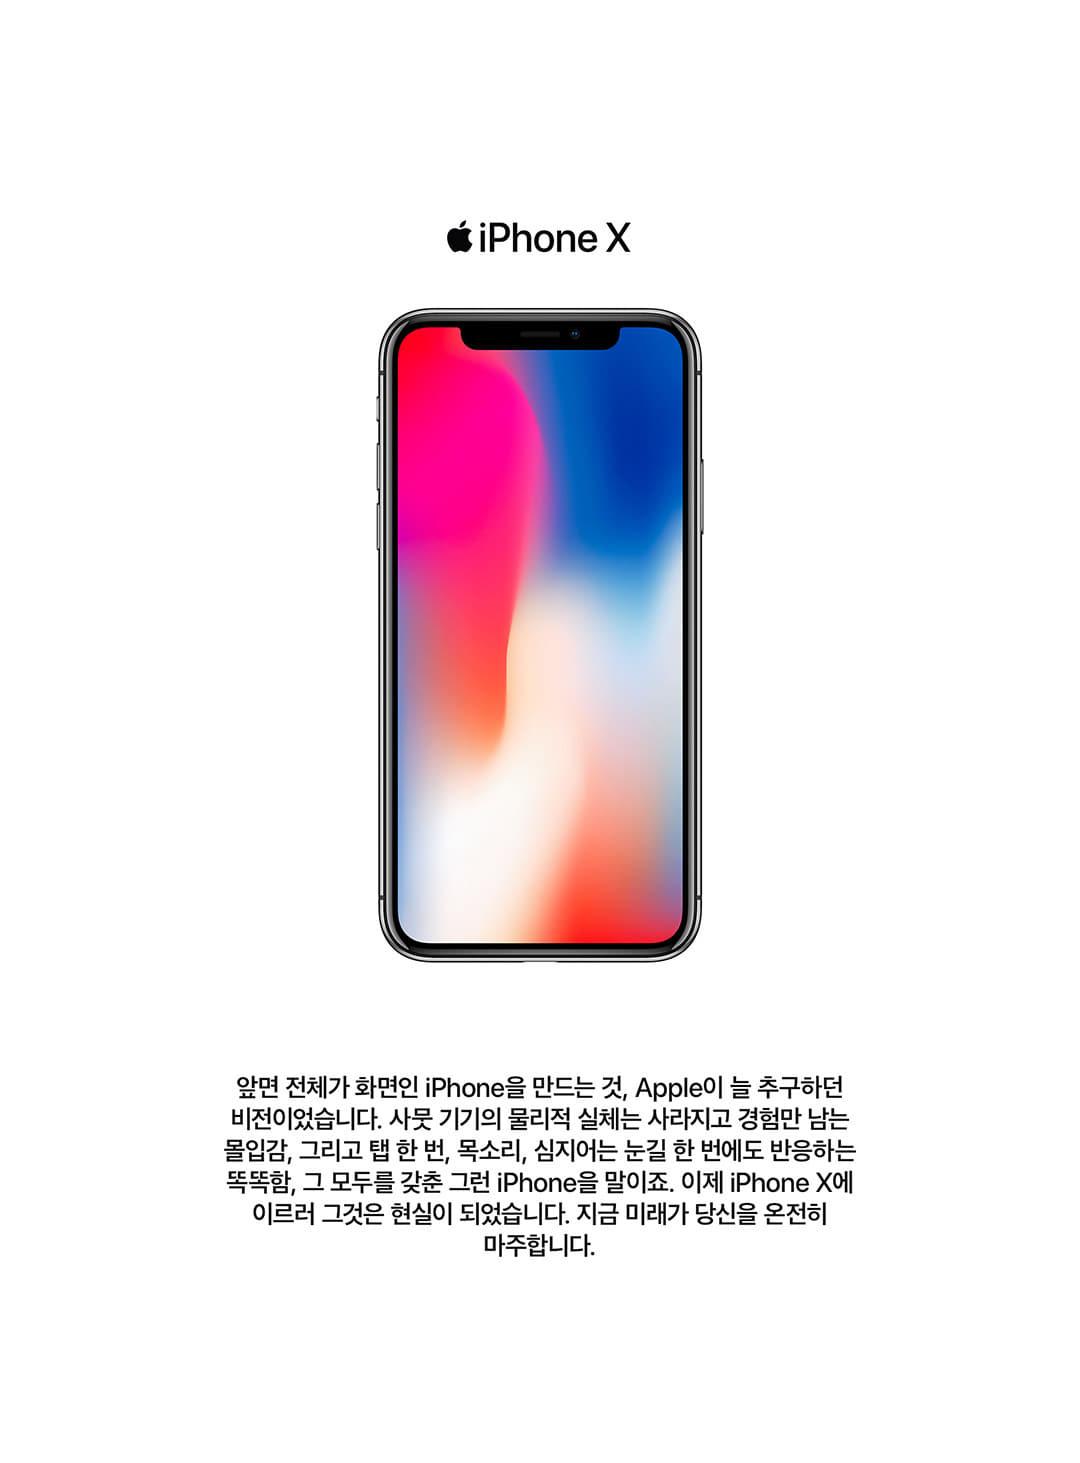 iPhoneX 앞면 전체가 화면인 iPhone을 만드는 것, Apple이 늘 추구하던 비전이었습니다. 사뭇 기기의 물리적 실체는 사라지고 경험만 남은 몰입감, 그리고 탭 한번, 목소리, 심지어는 눈길 한번에도 반응하는 똑똑함, 그모두를 갖춘 그런 iPhone을 말이죠. 이제는 iPhoneX 에 이르러 그것은 현실이 되었습니다. 지금 미래가 당신을 온전히 마주합니다.